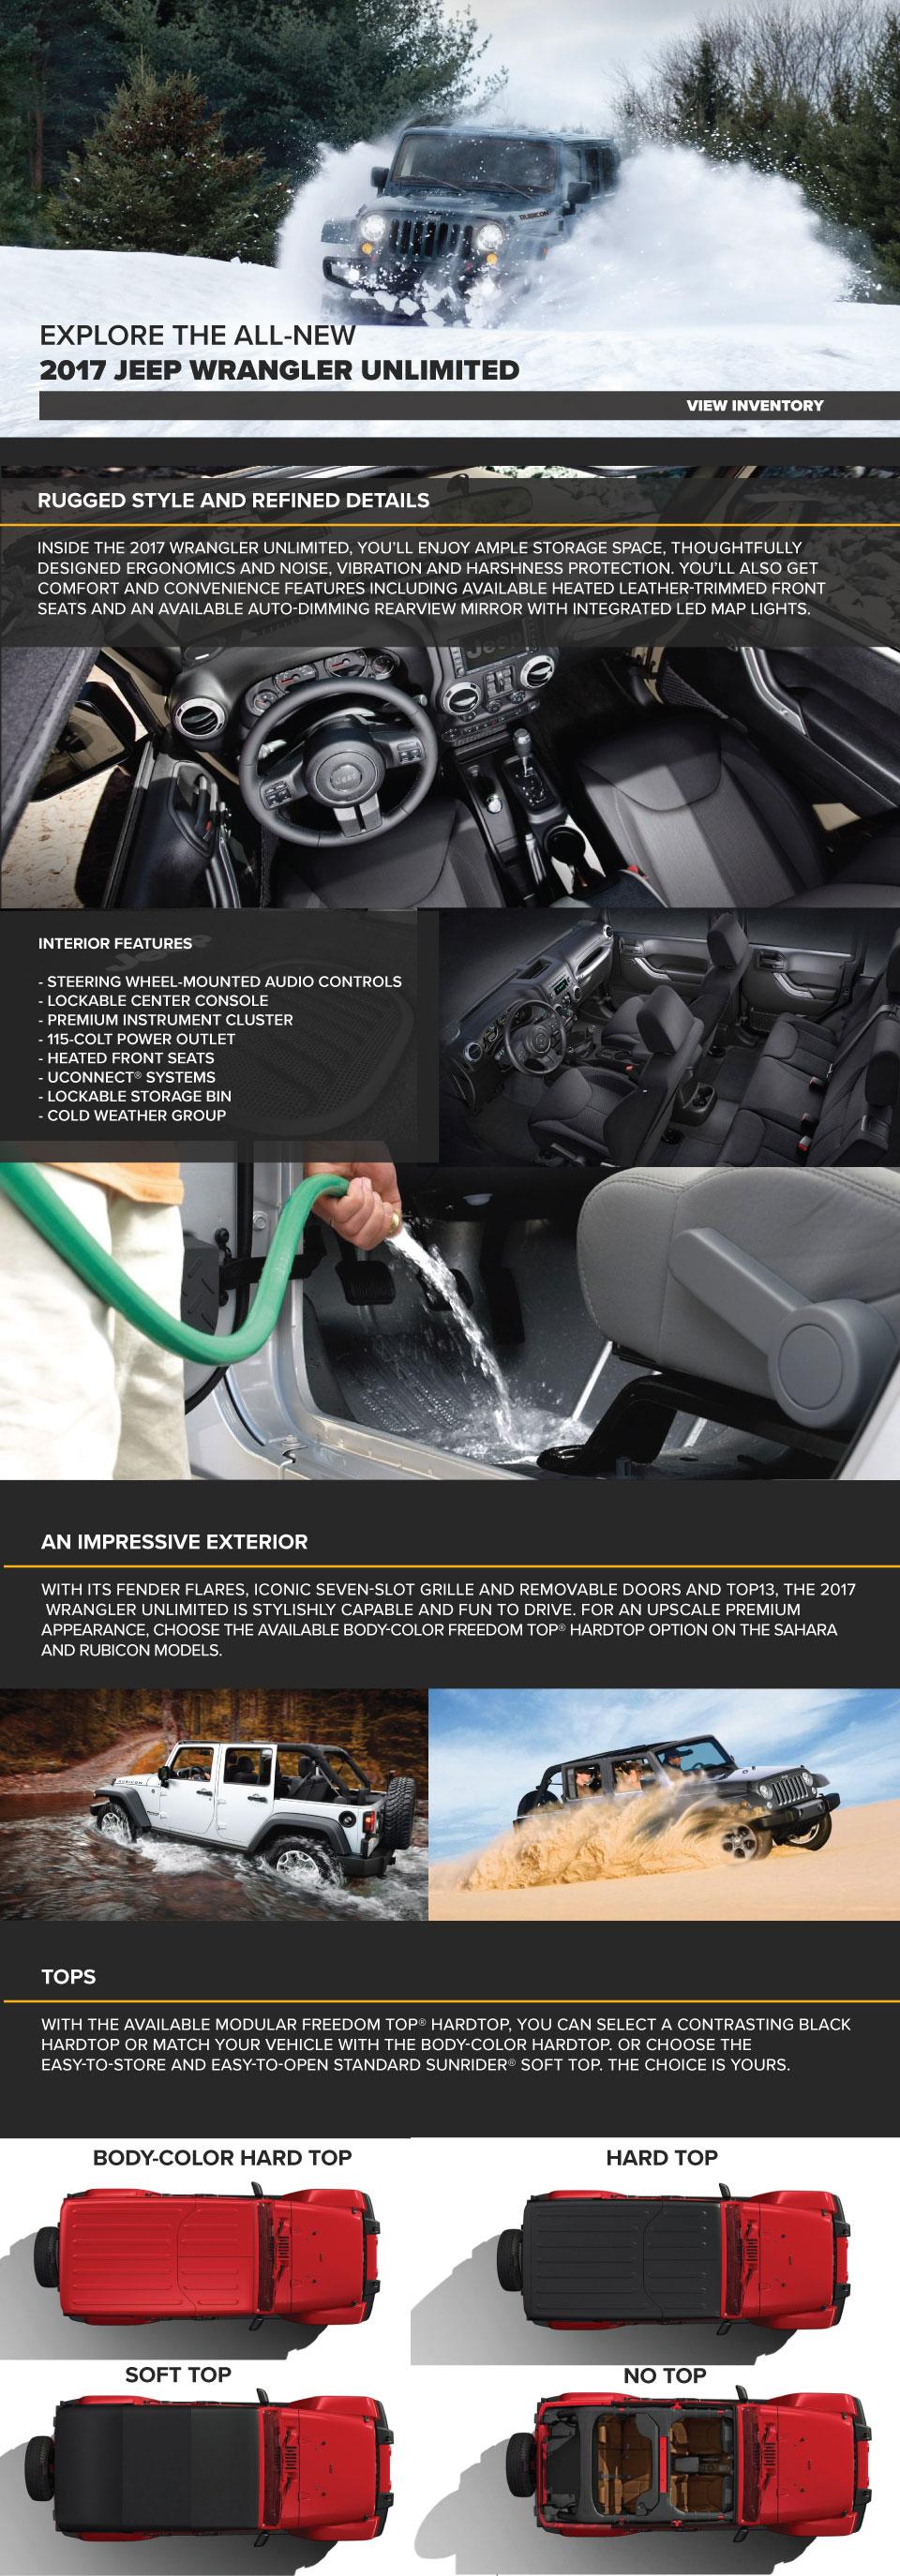 Secor Chrysler Dodge Jeep Ram